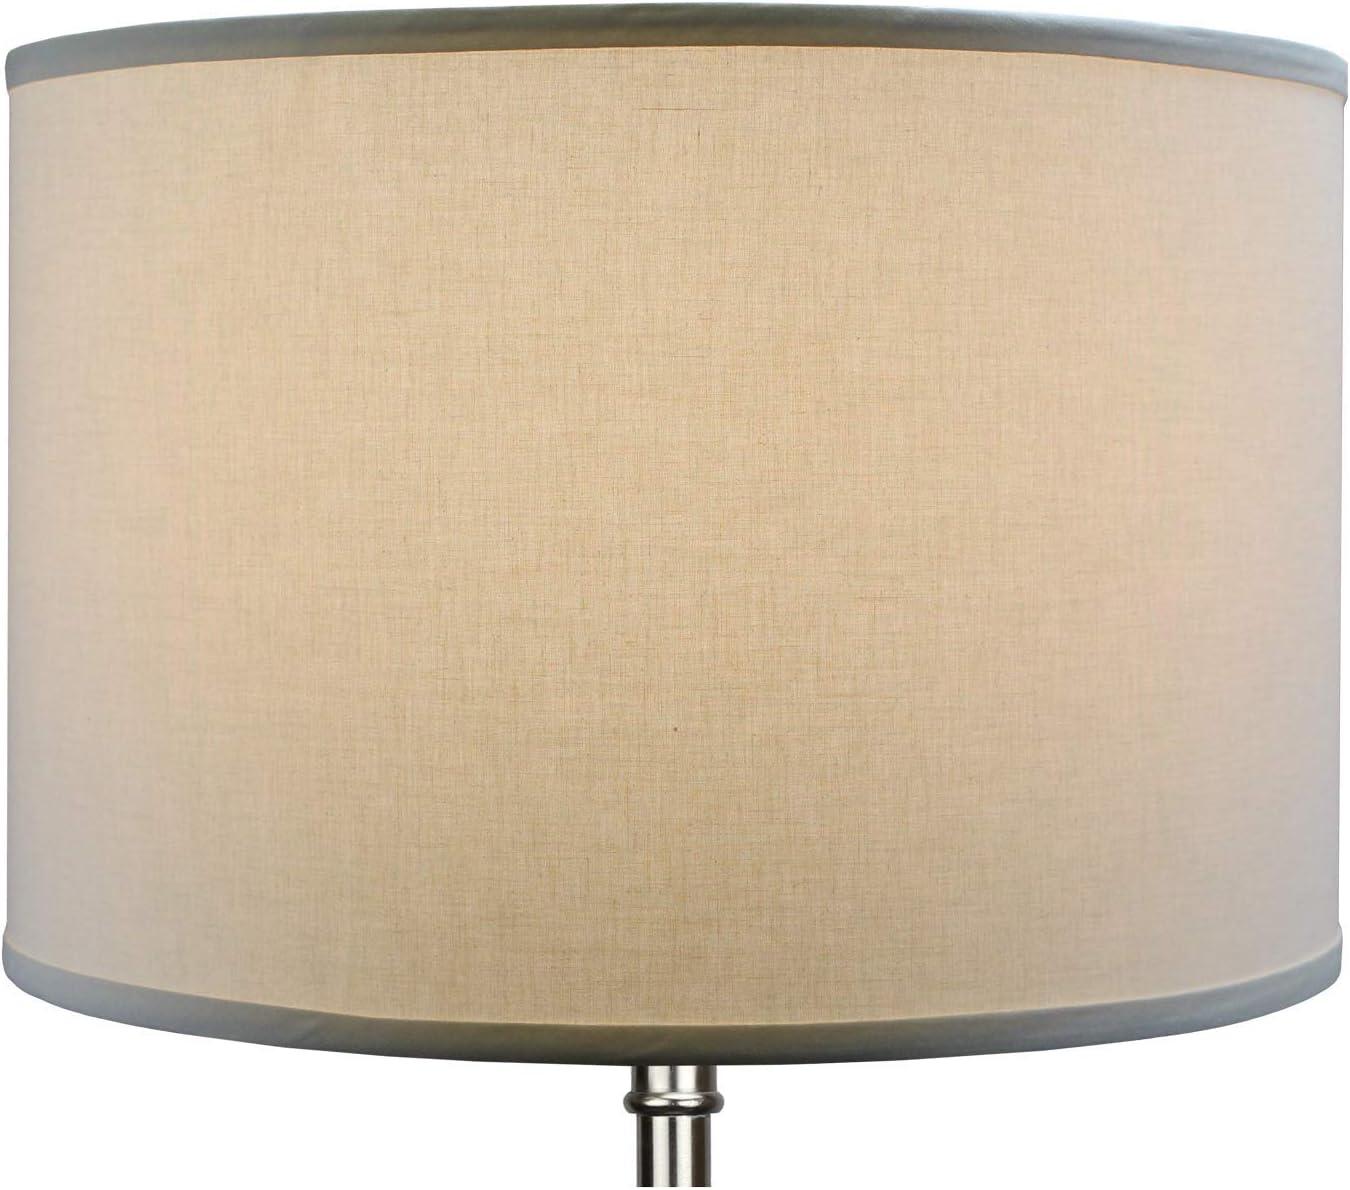 "FenchelShades.com 18"" Top Diameter x 18"" Bottom Diameter 12"" Height Cylinder Drum Lampshade USA Made (Designer Off White) Ivory"